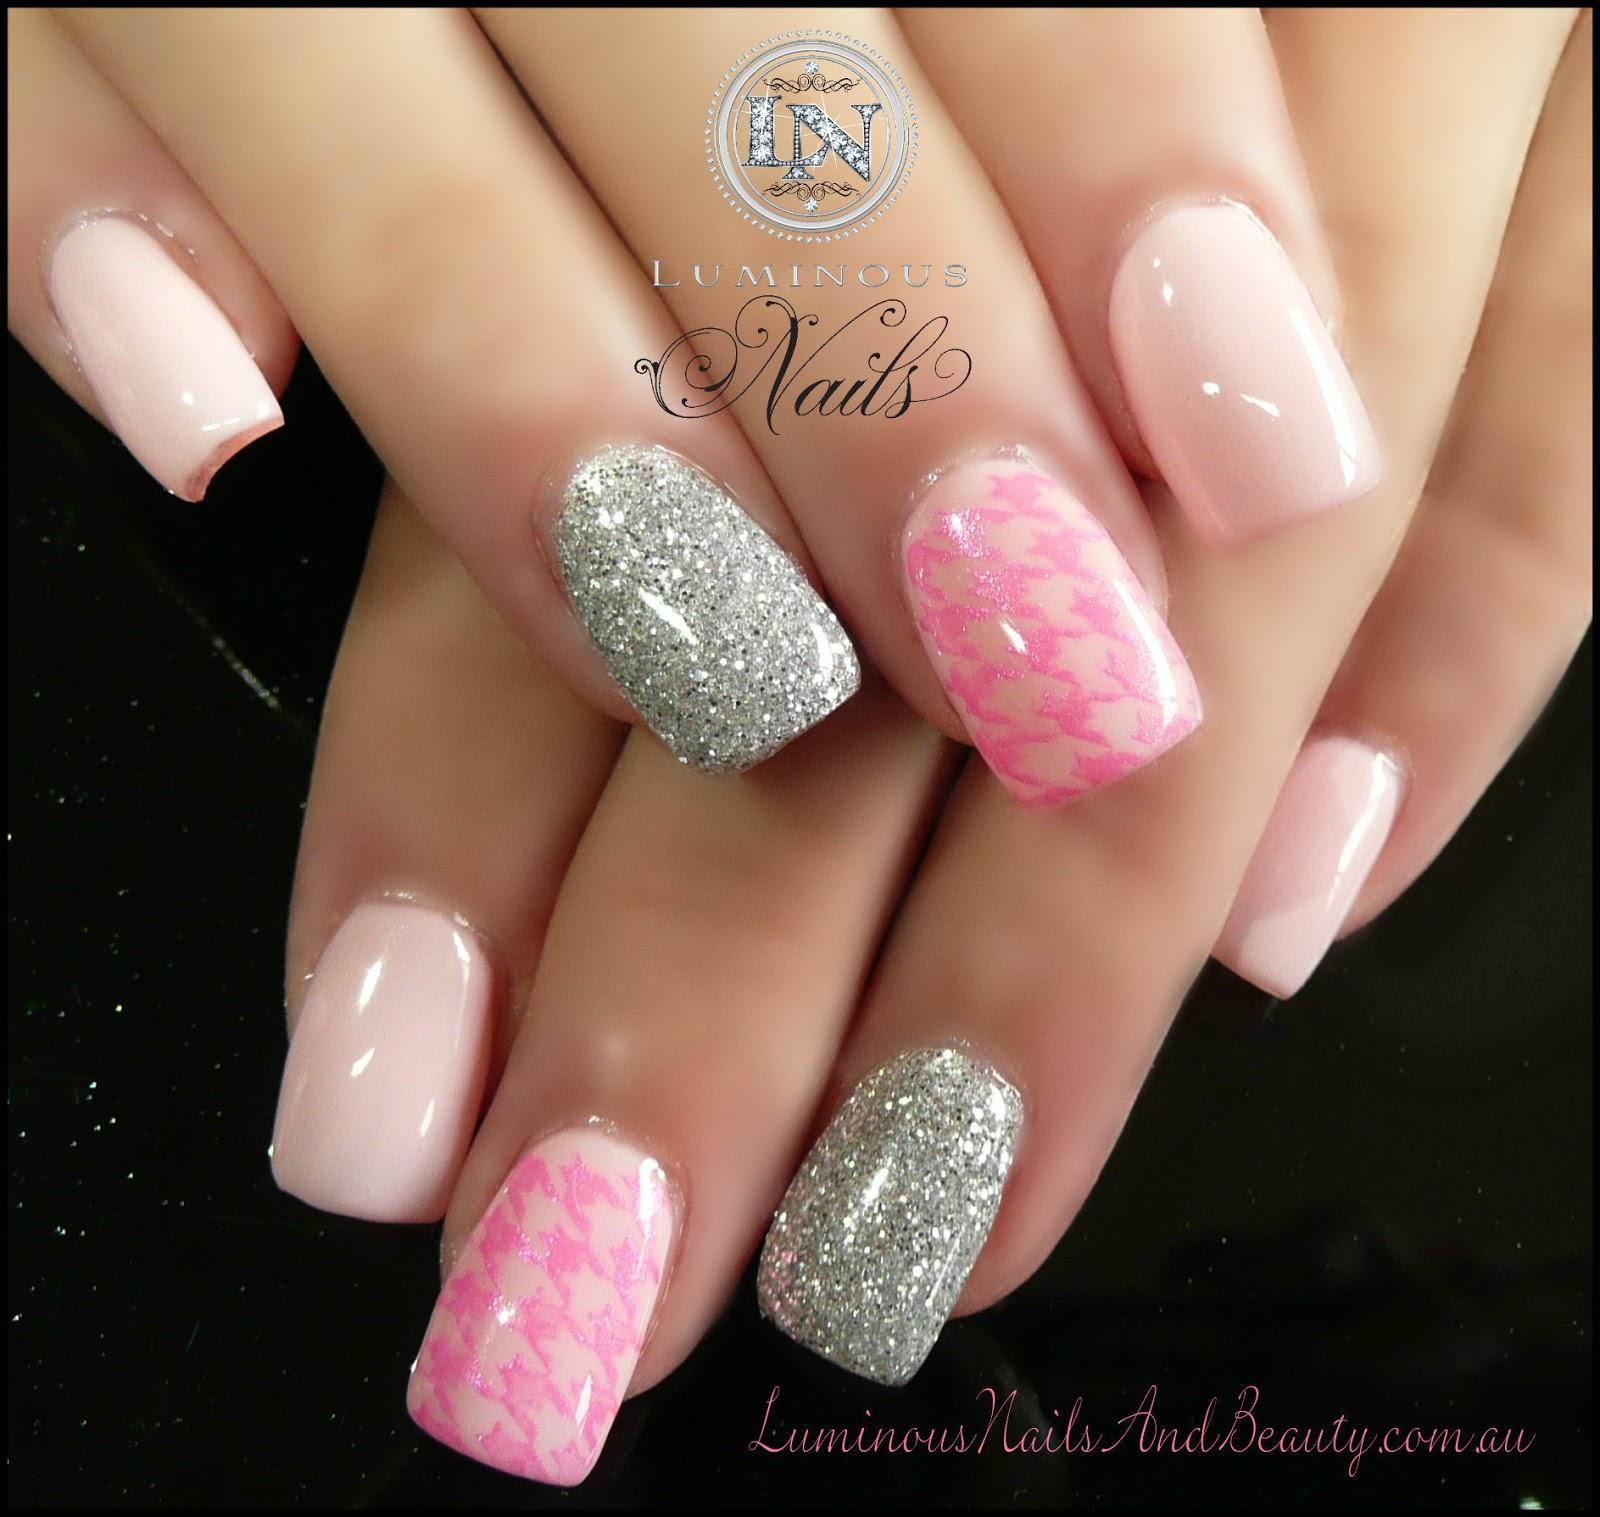 Pink Acrylic Nail Designs: Luminous Nails: February 2013